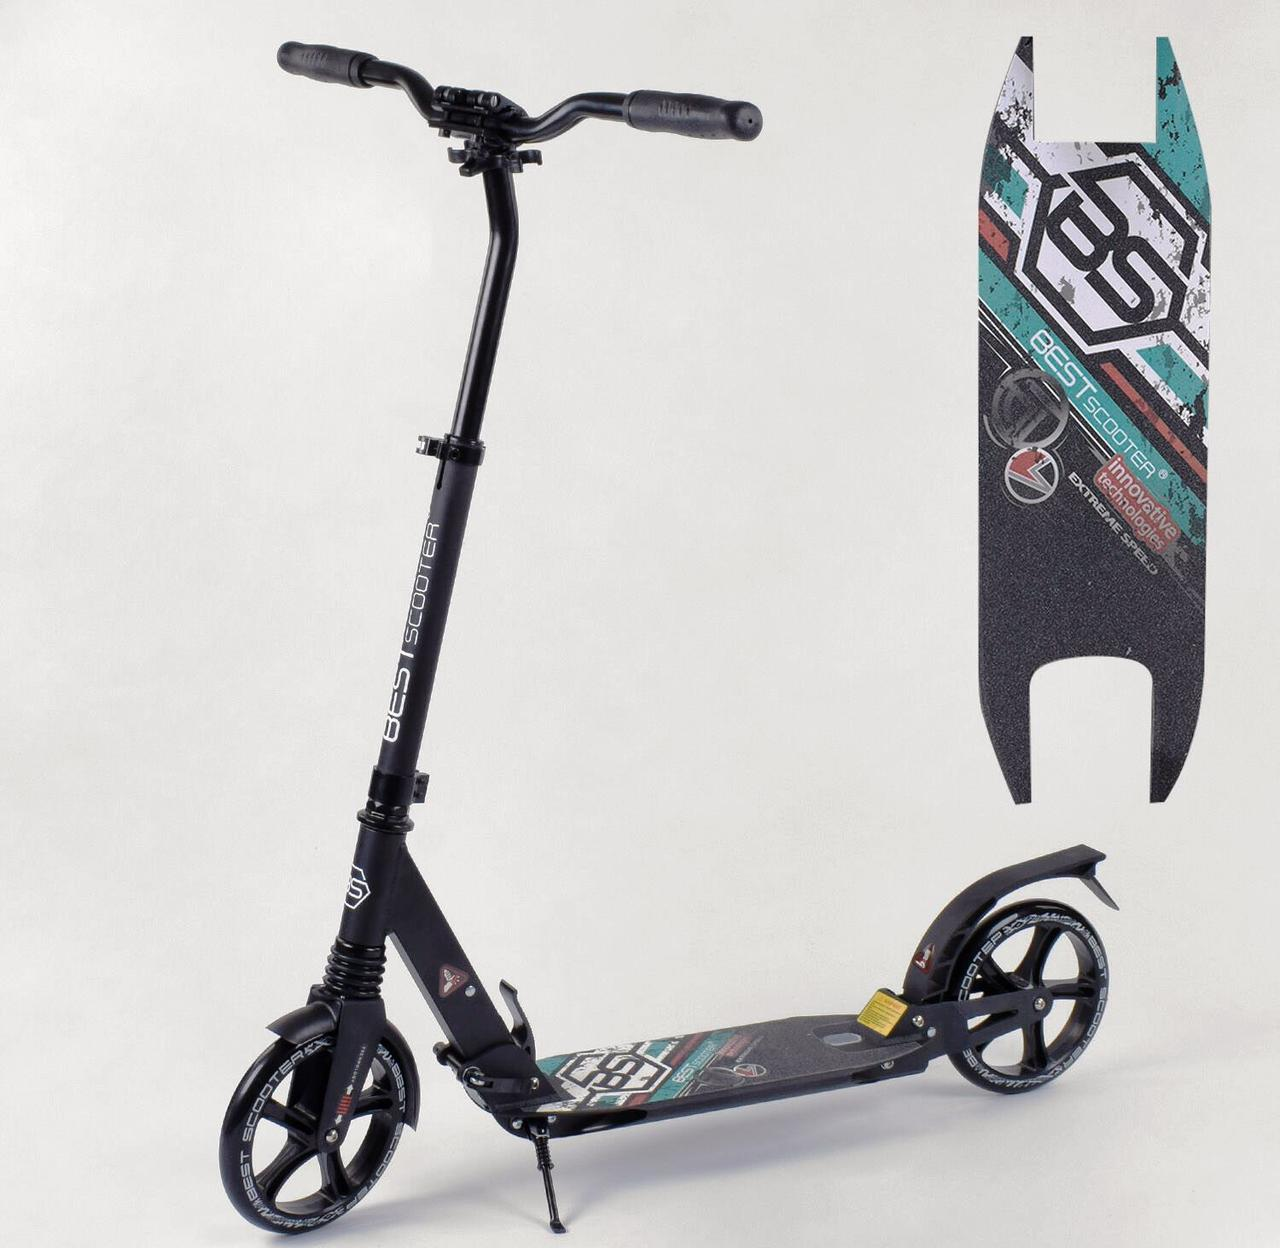 Самокат алюминиевый 22788 Best Scooter, d колес - 20см, колеса PU, 2 аммортизатора